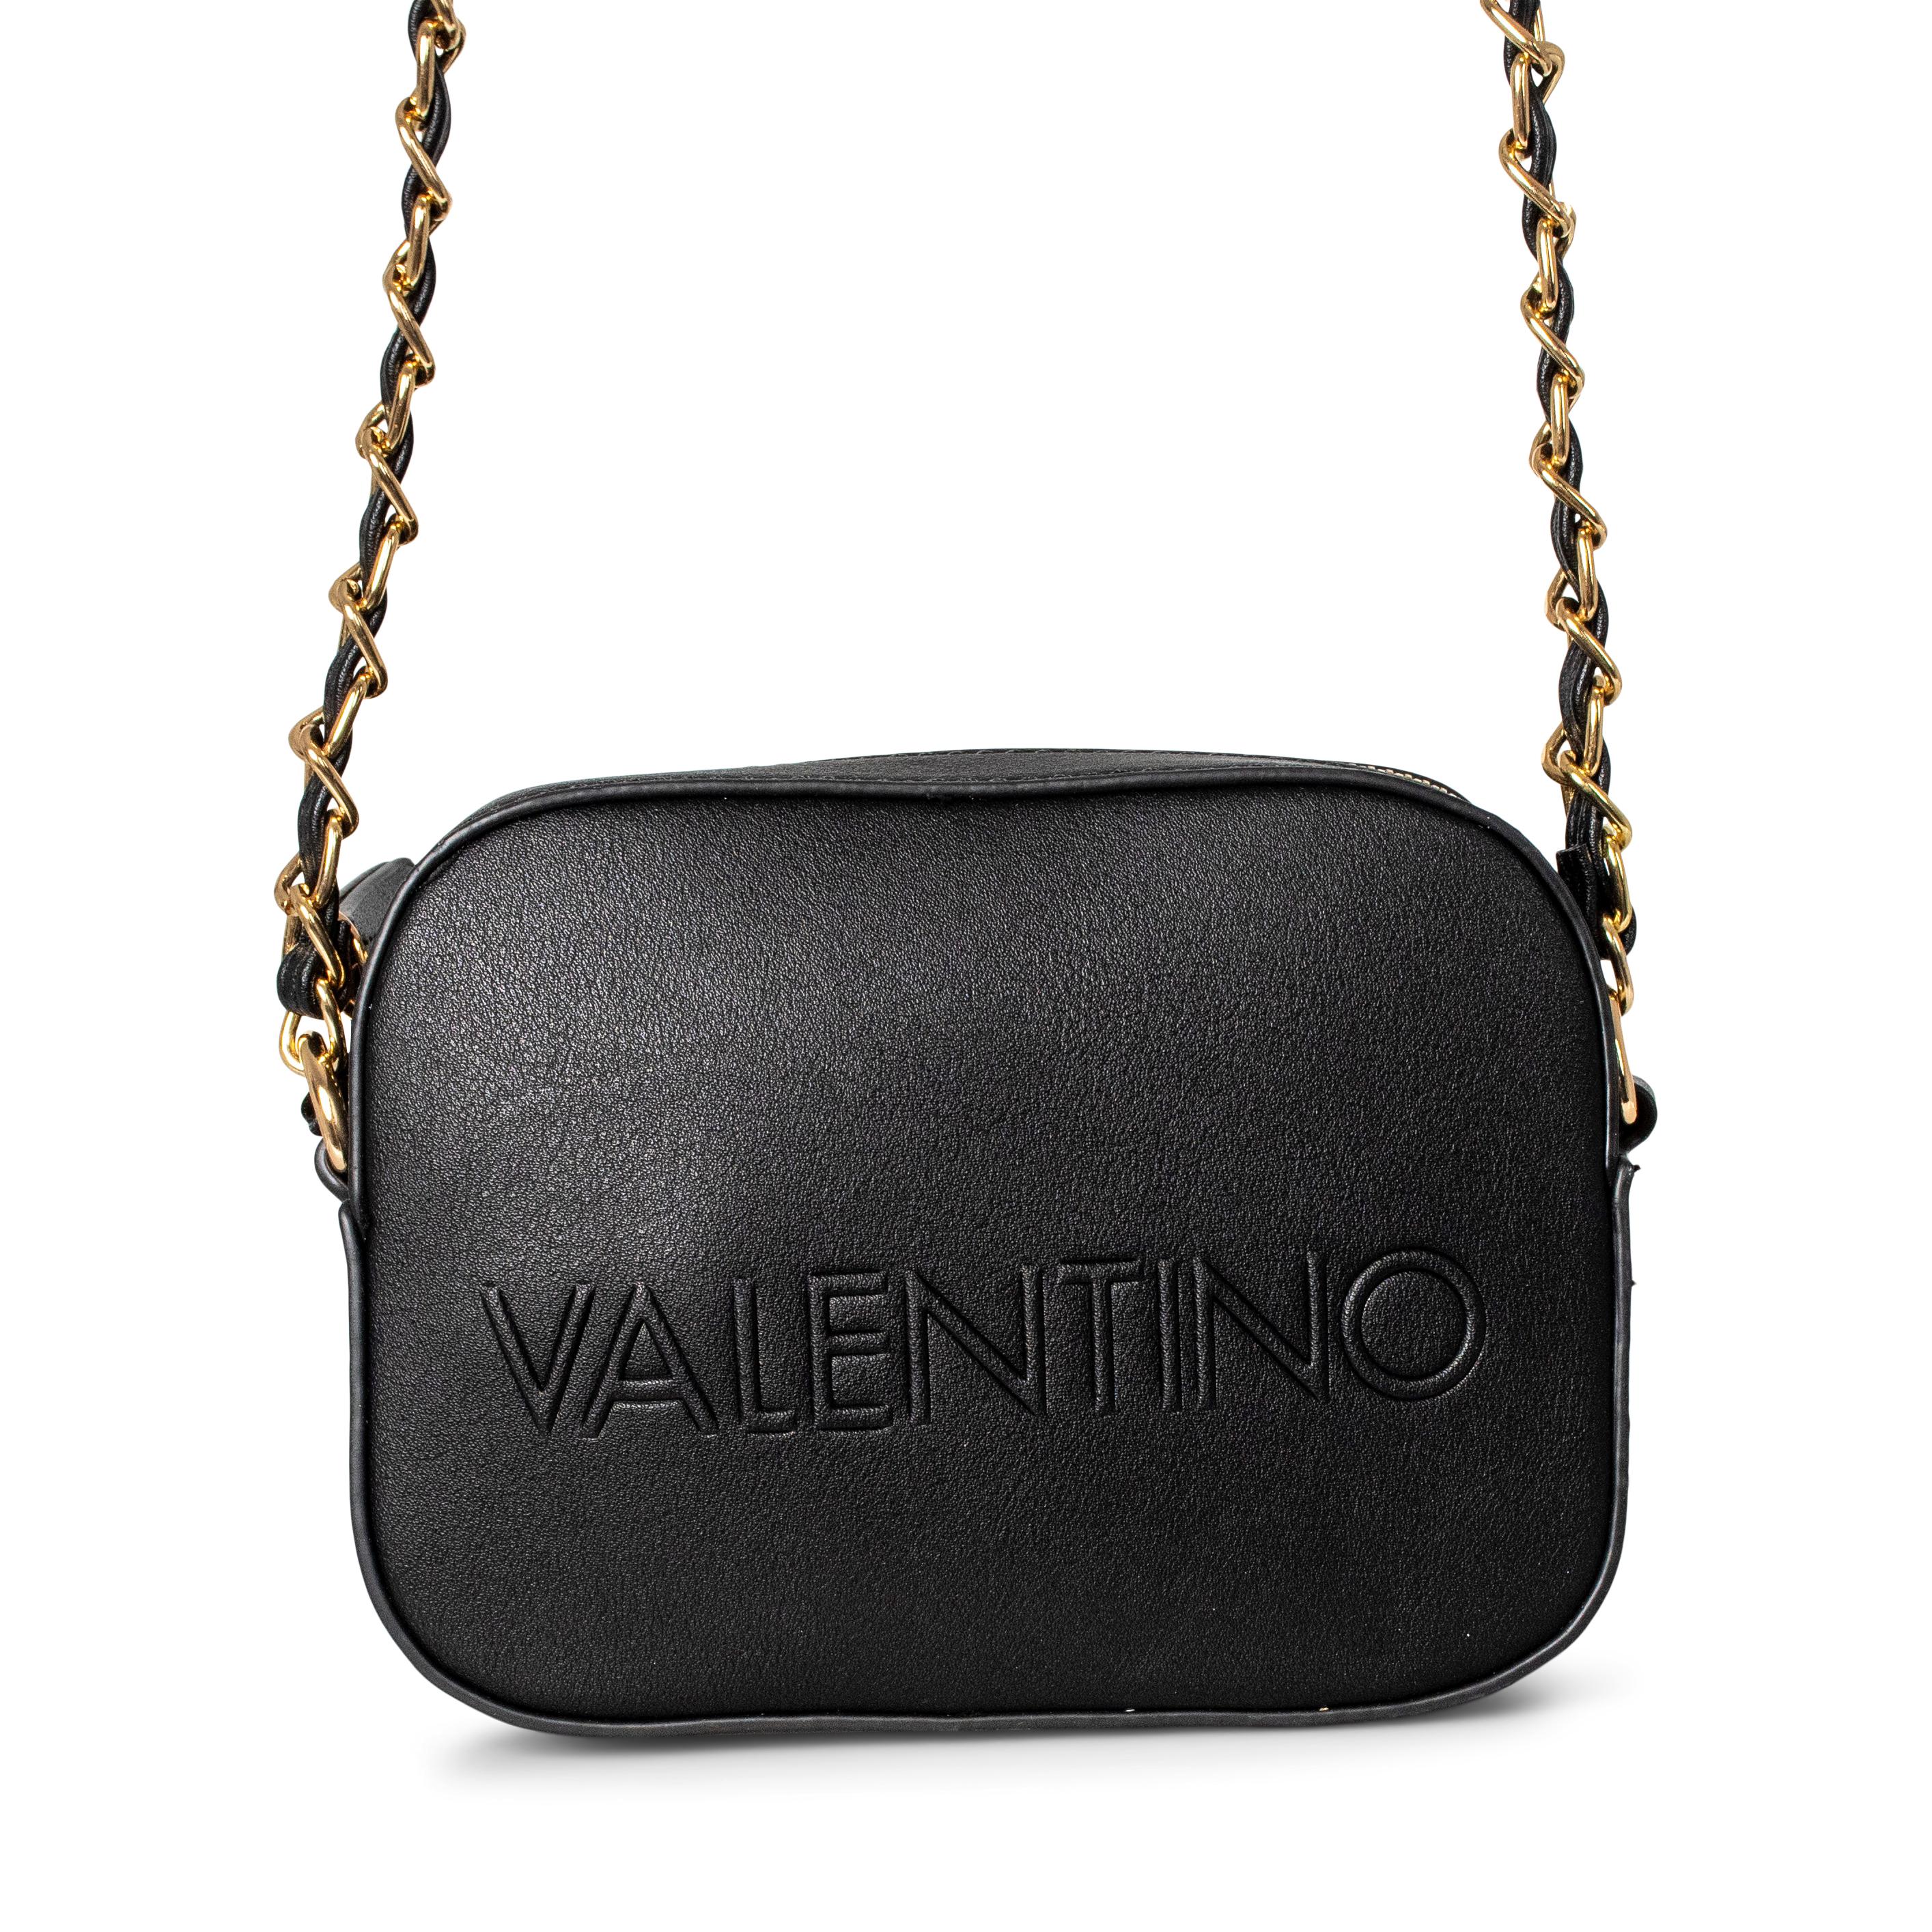 Valentino Icon crossover